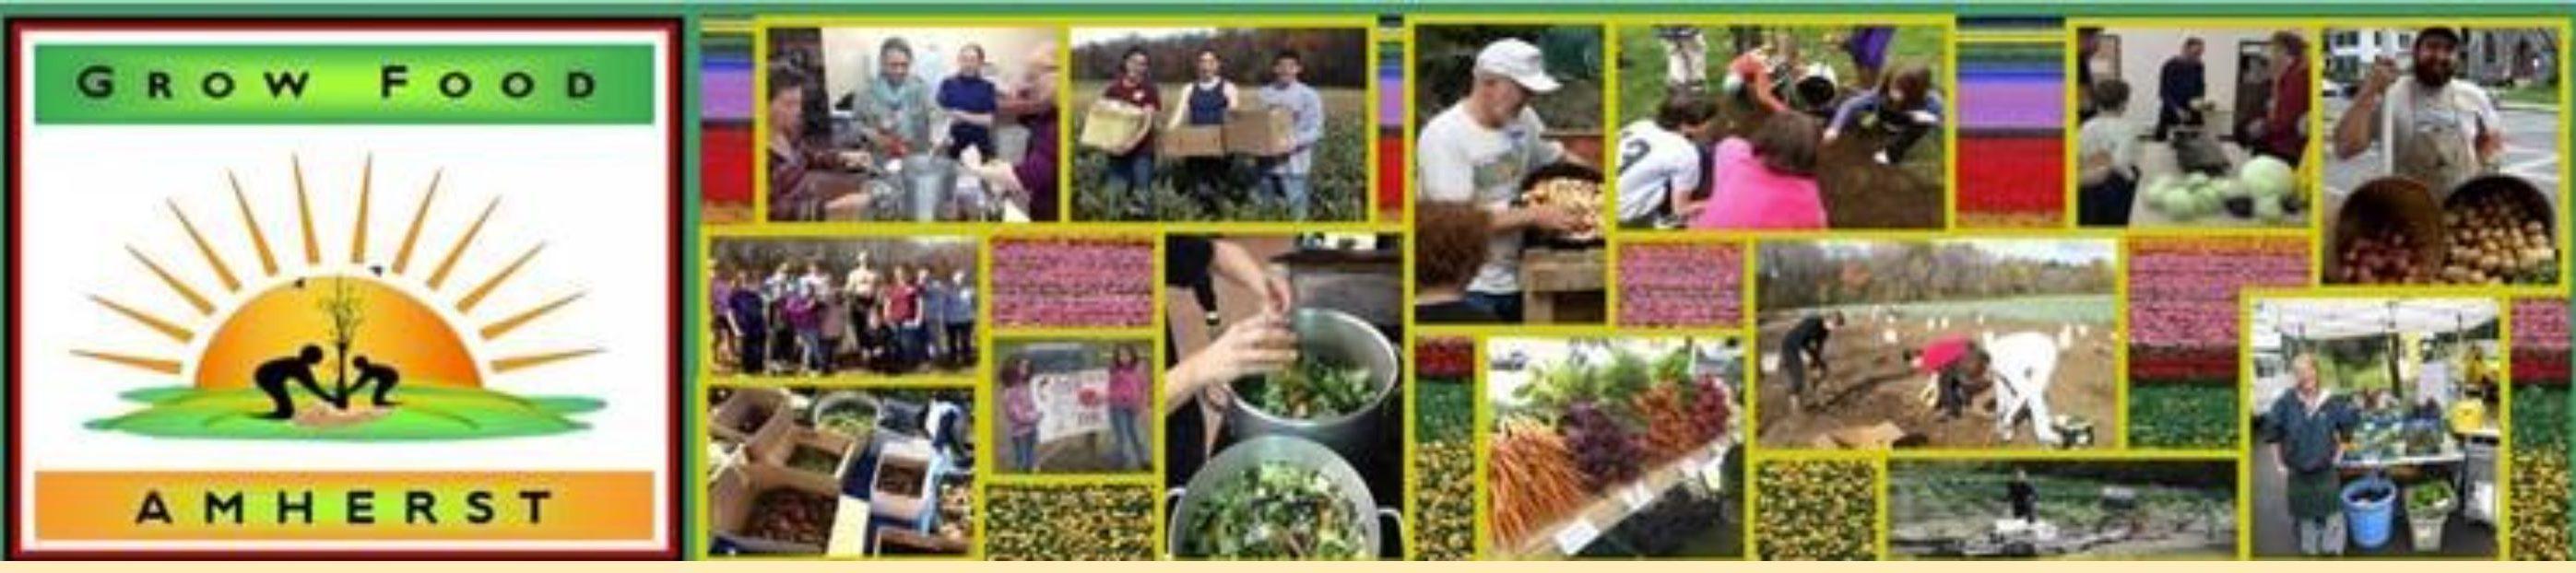 Grow Food Amherst